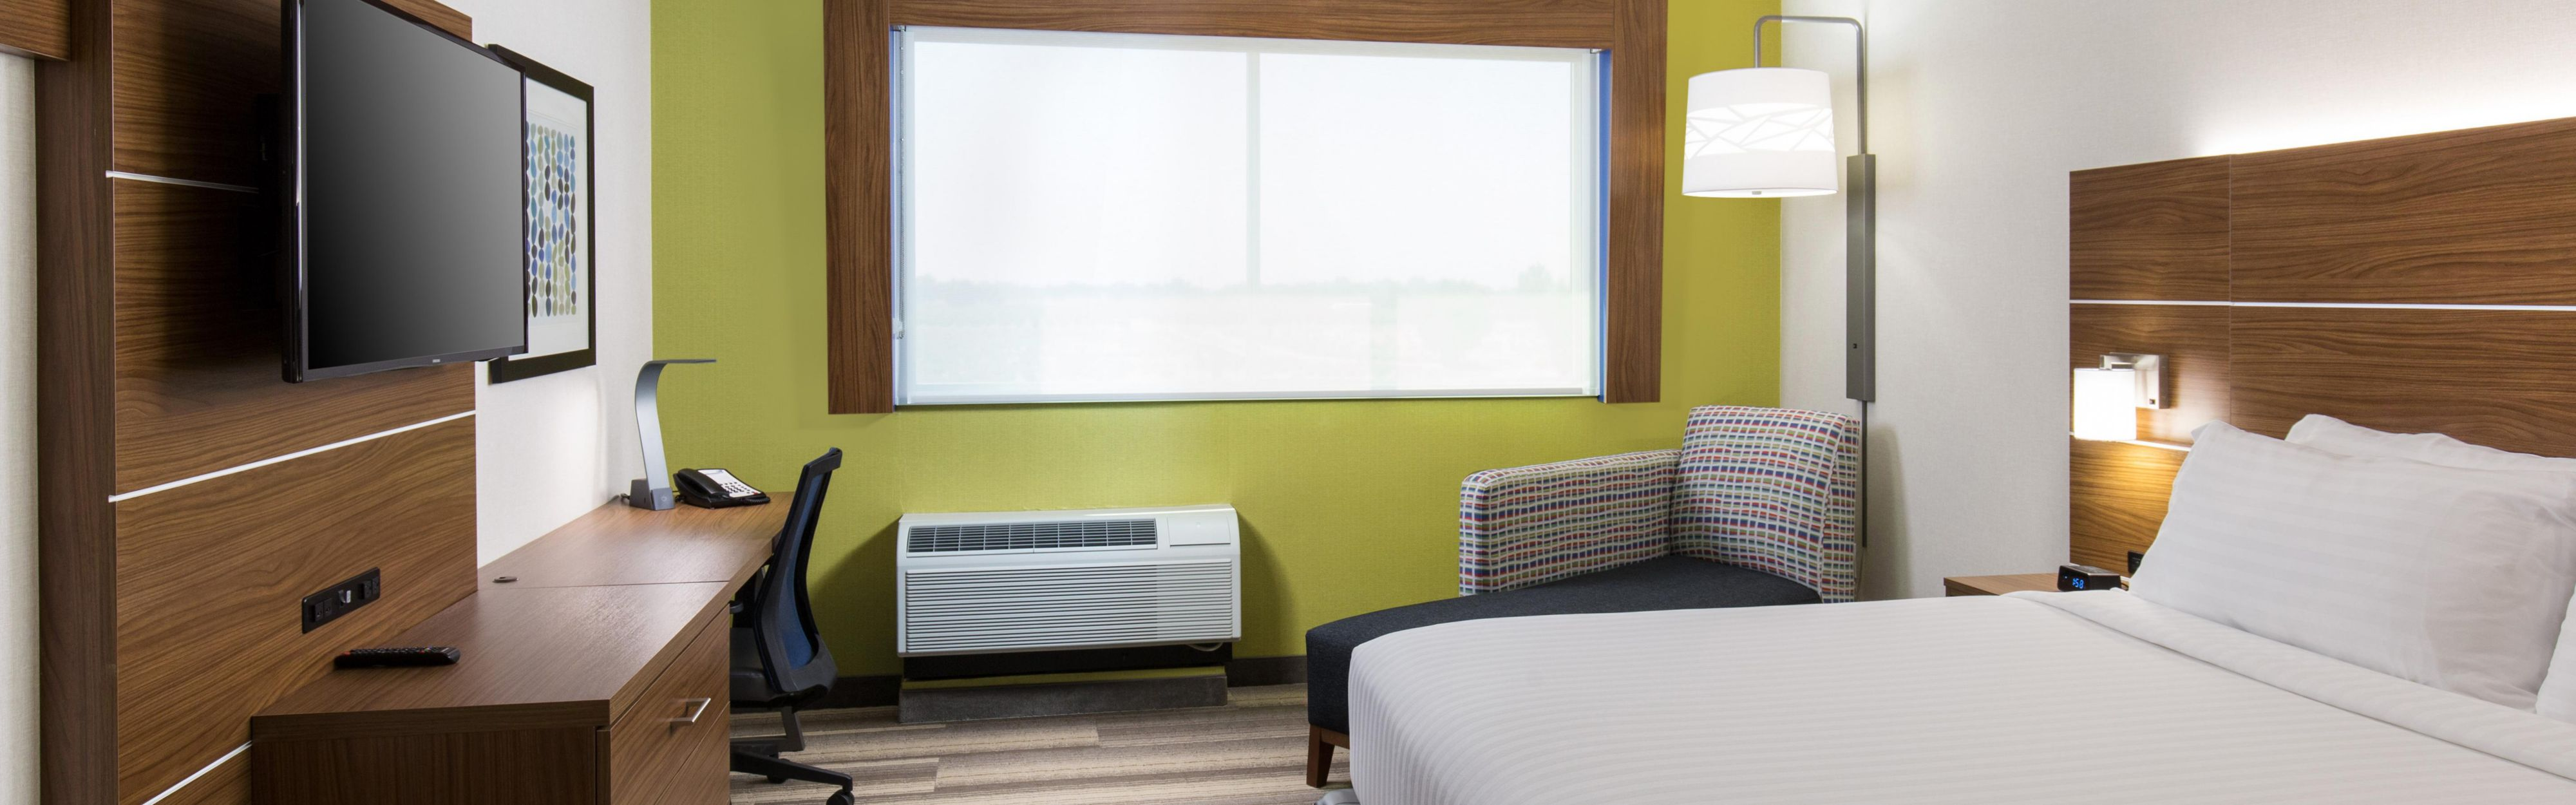 Holiday Inn Express Visalia image 1